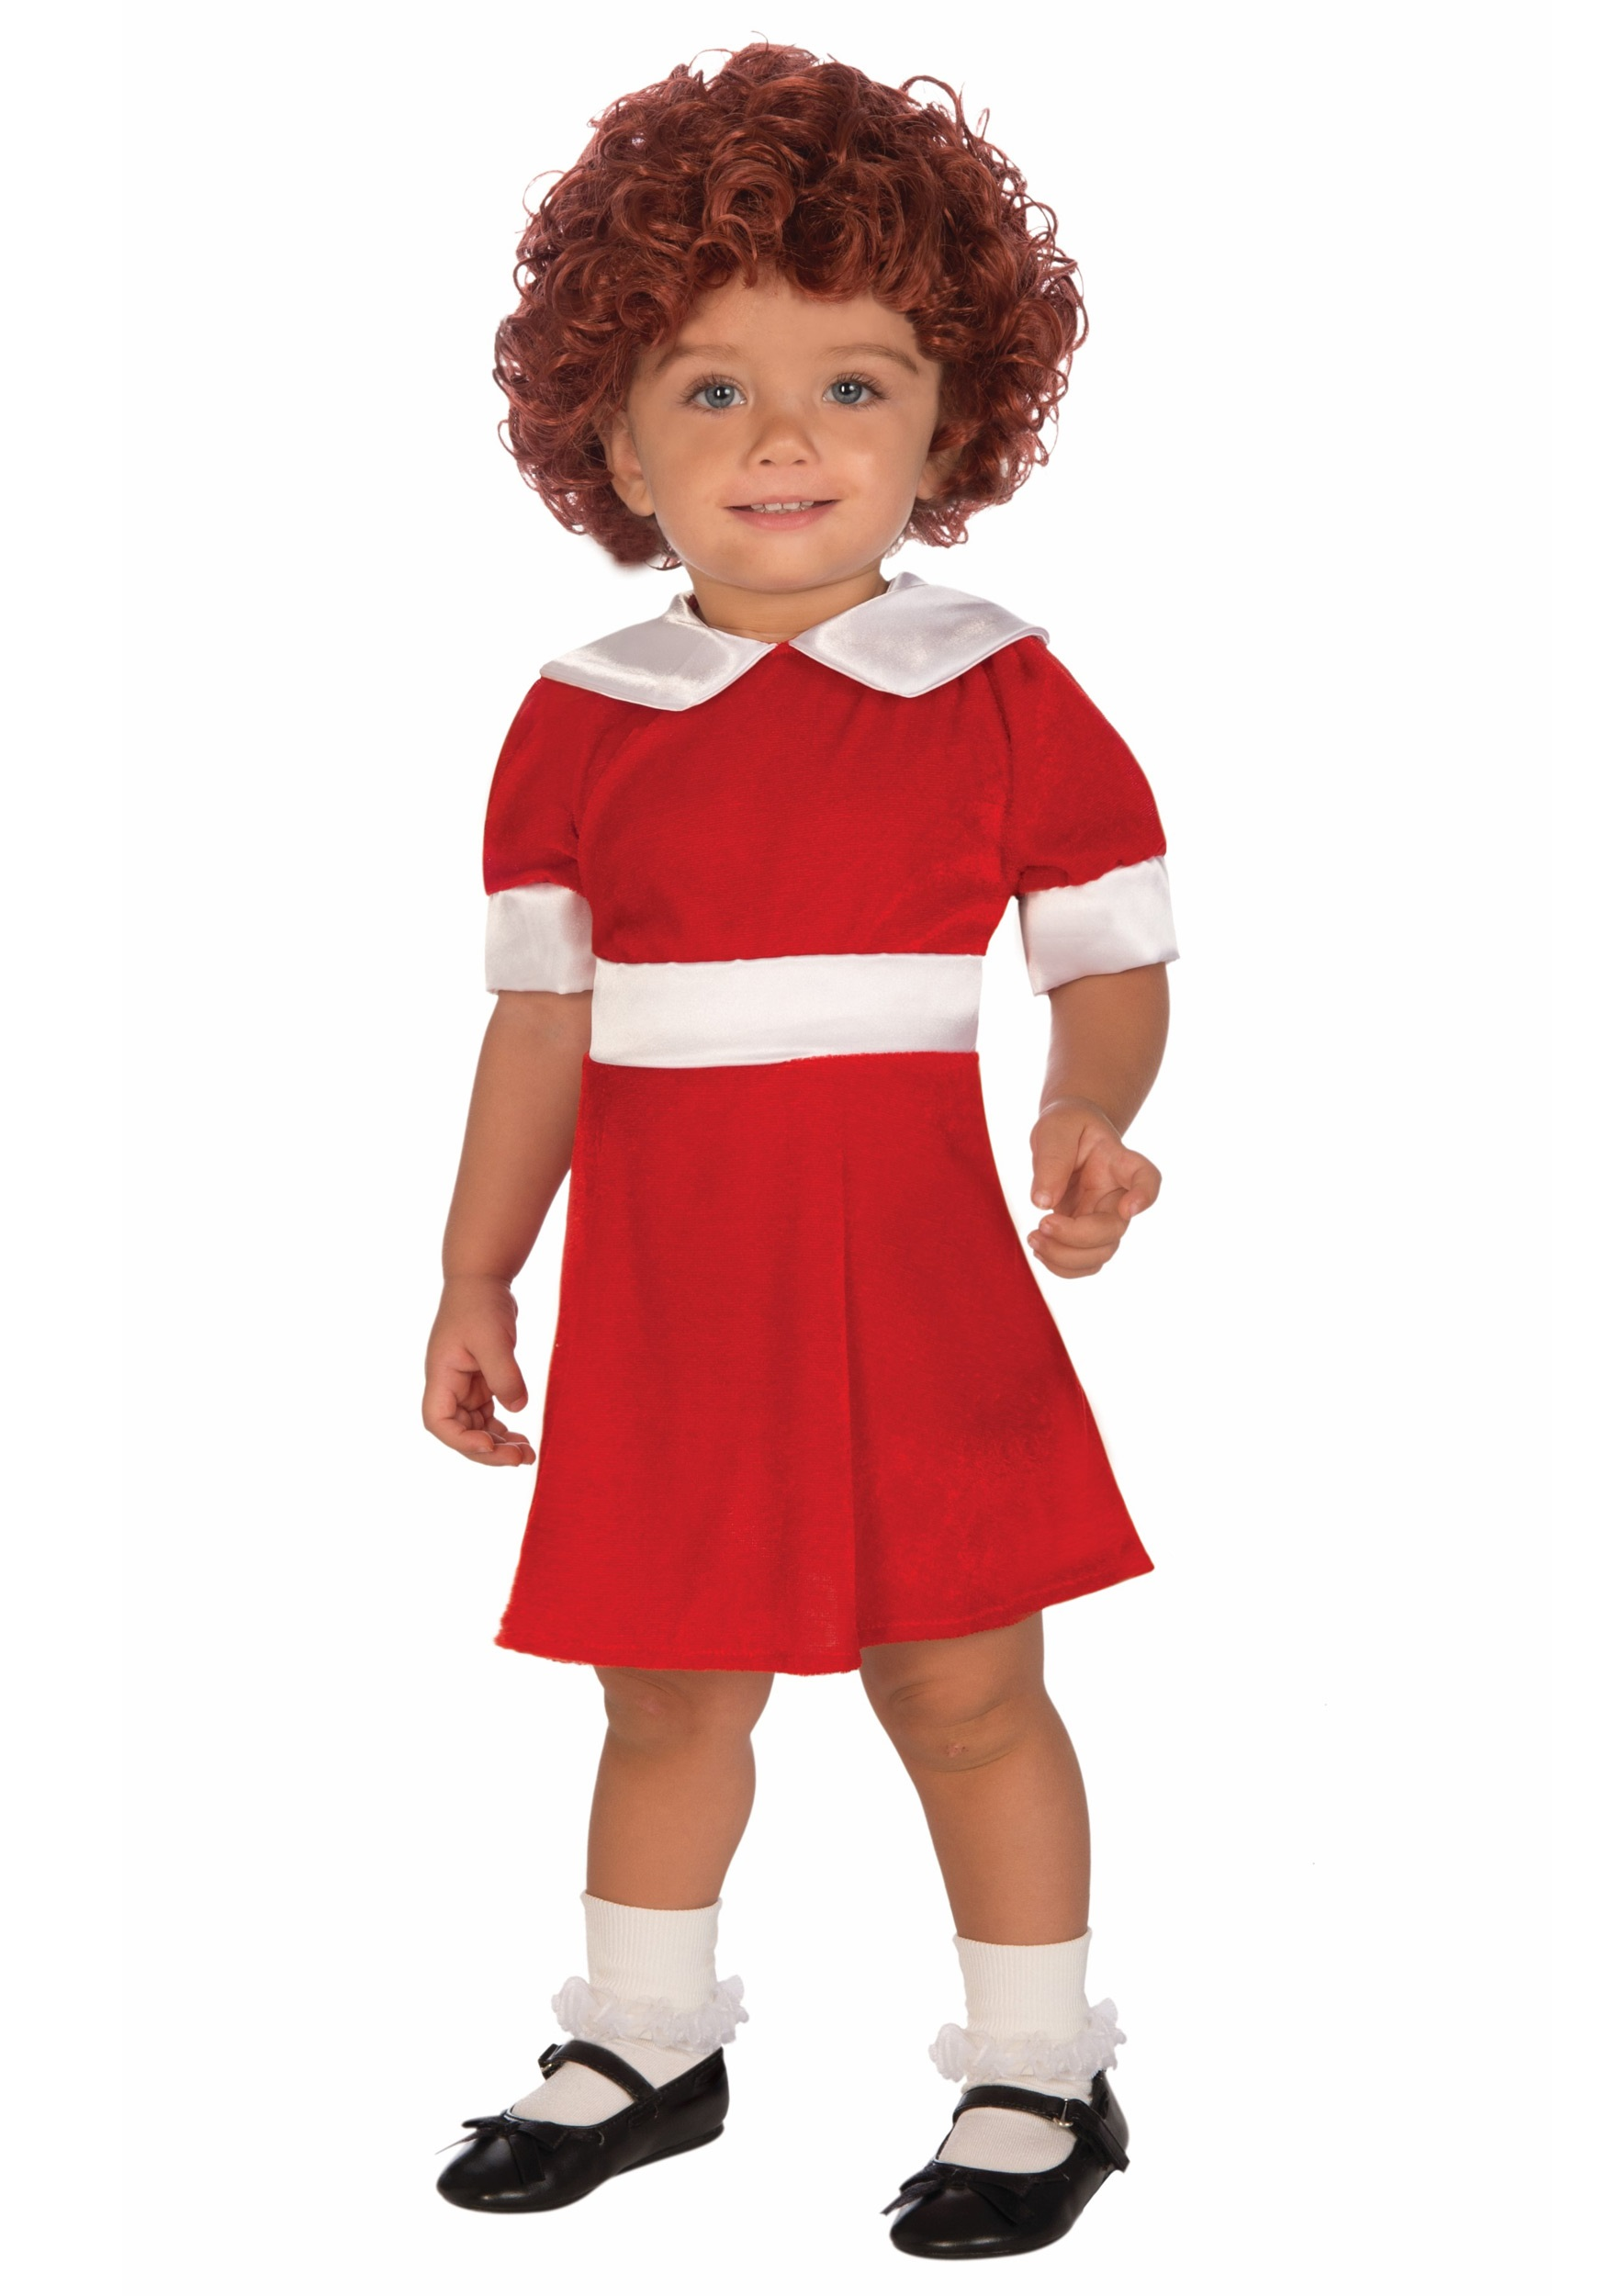 Toddler Annie Costume - Halloween Costumes